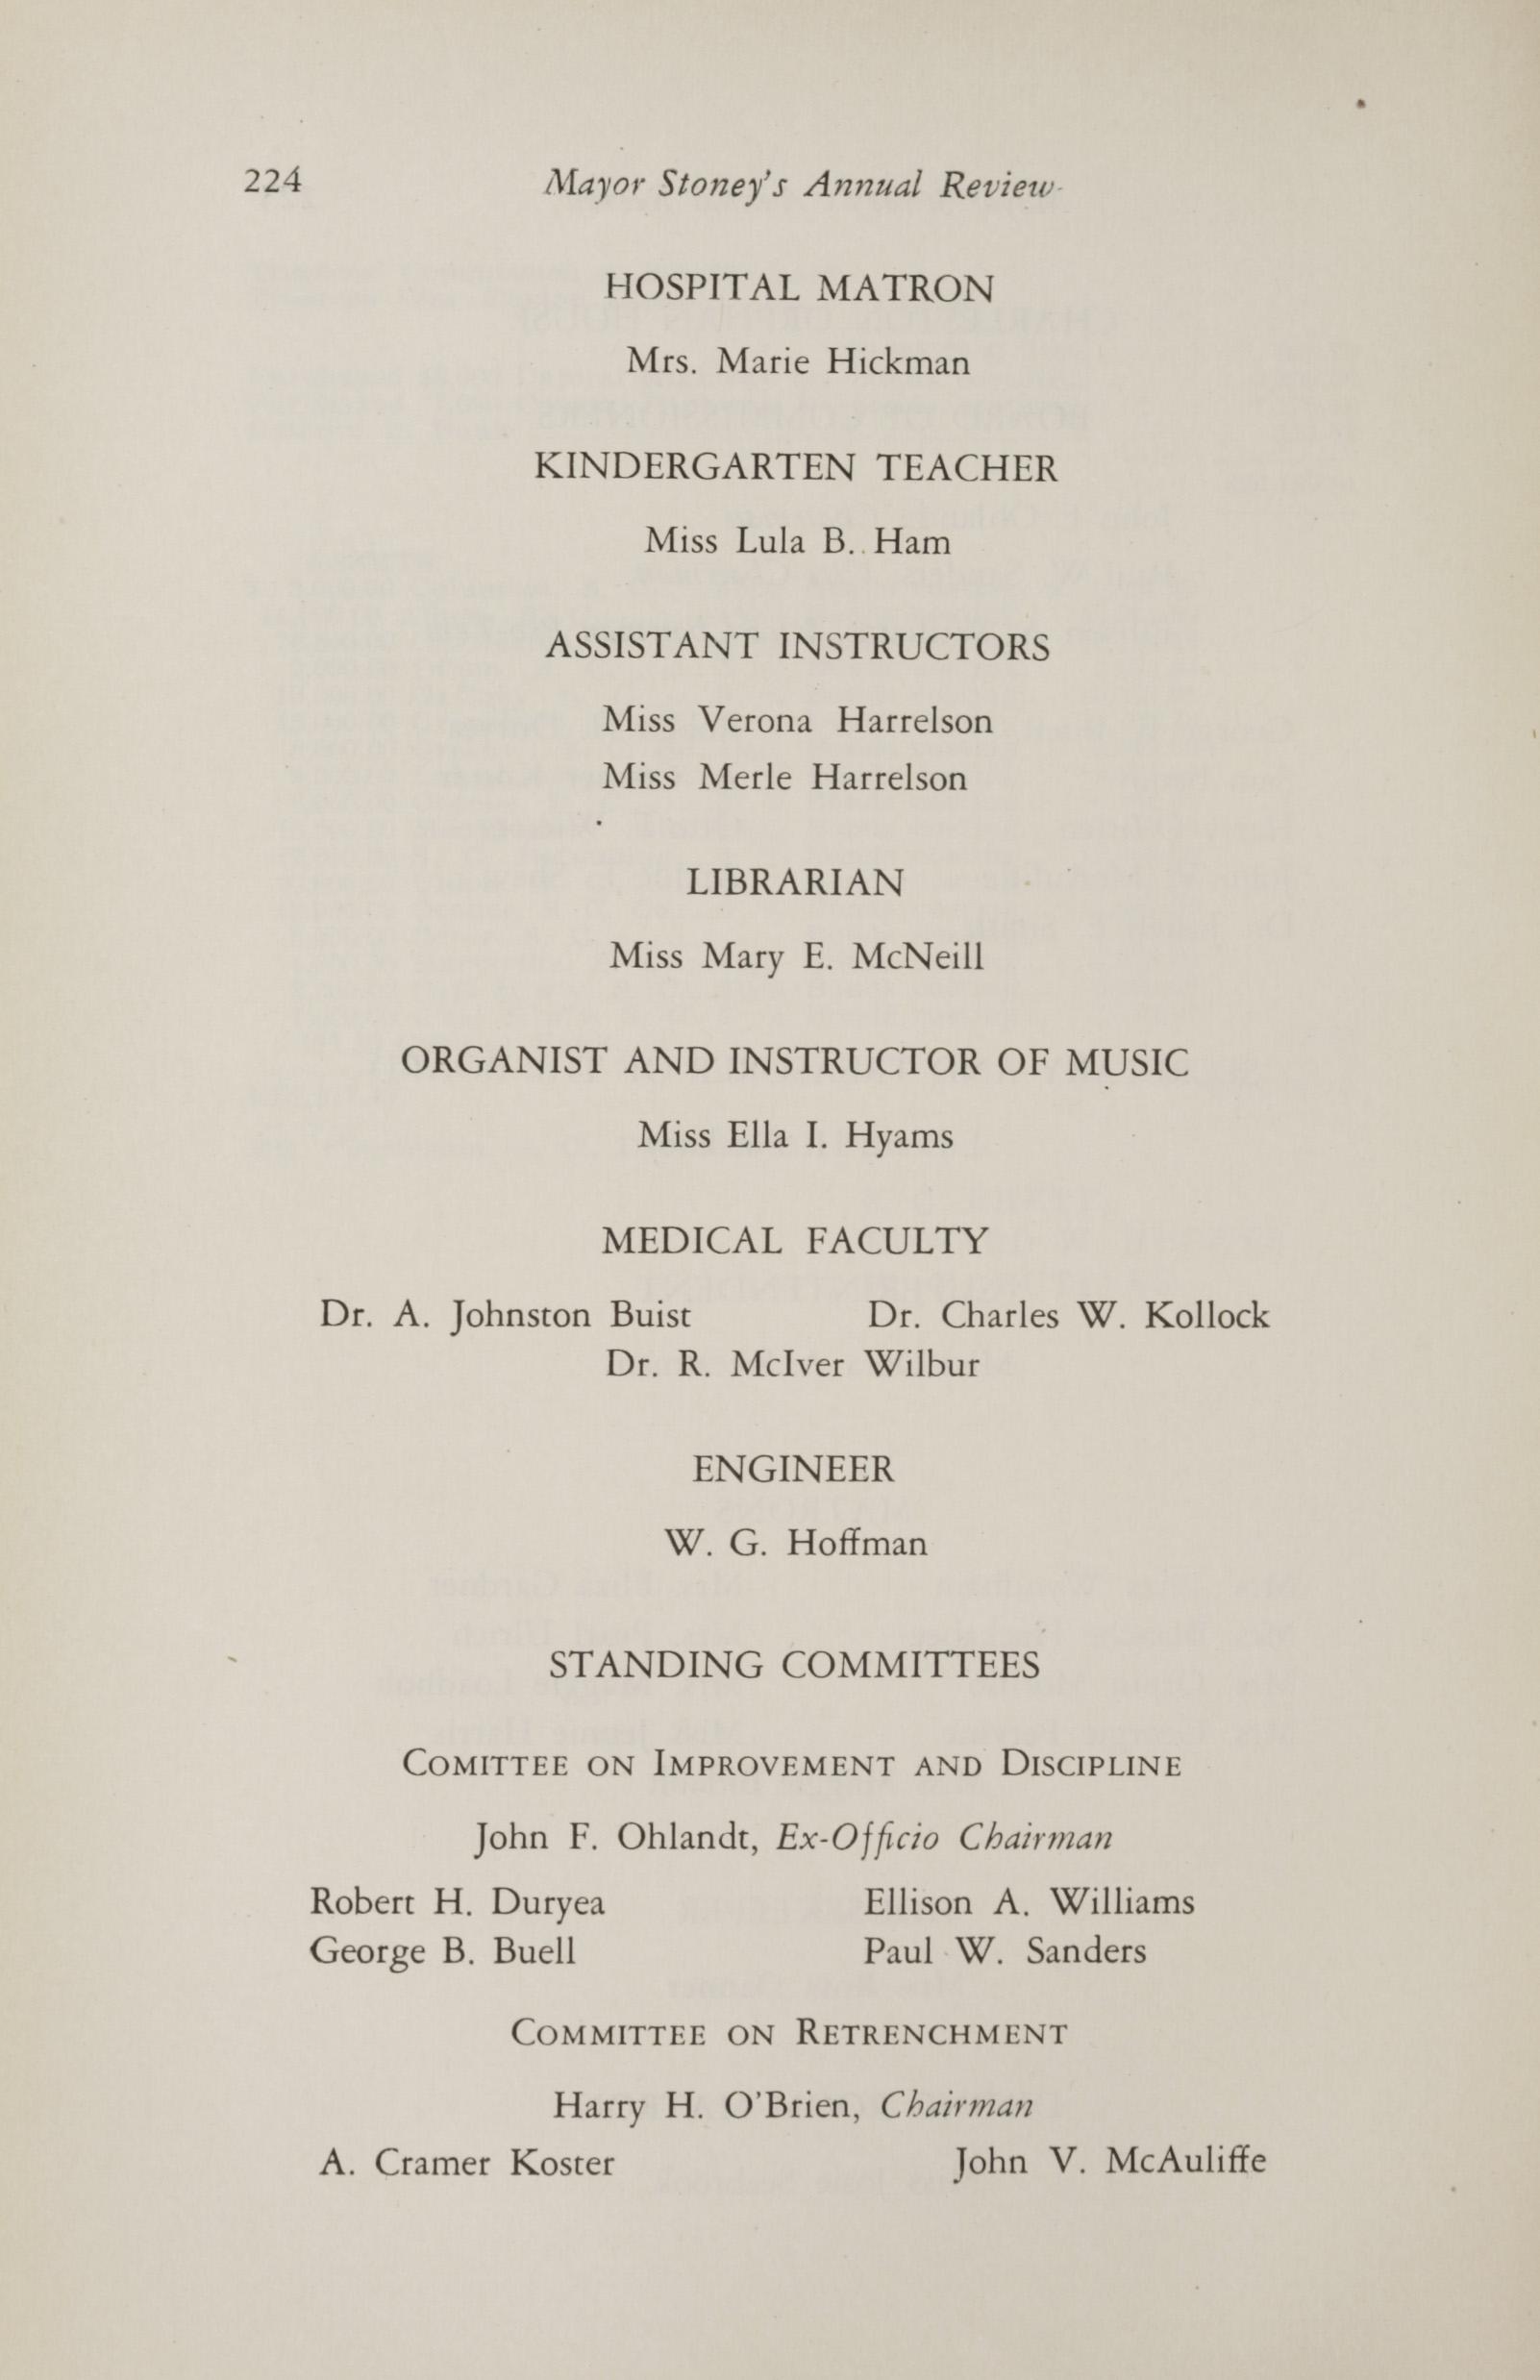 Charleston Yearbook, 1930, page 224